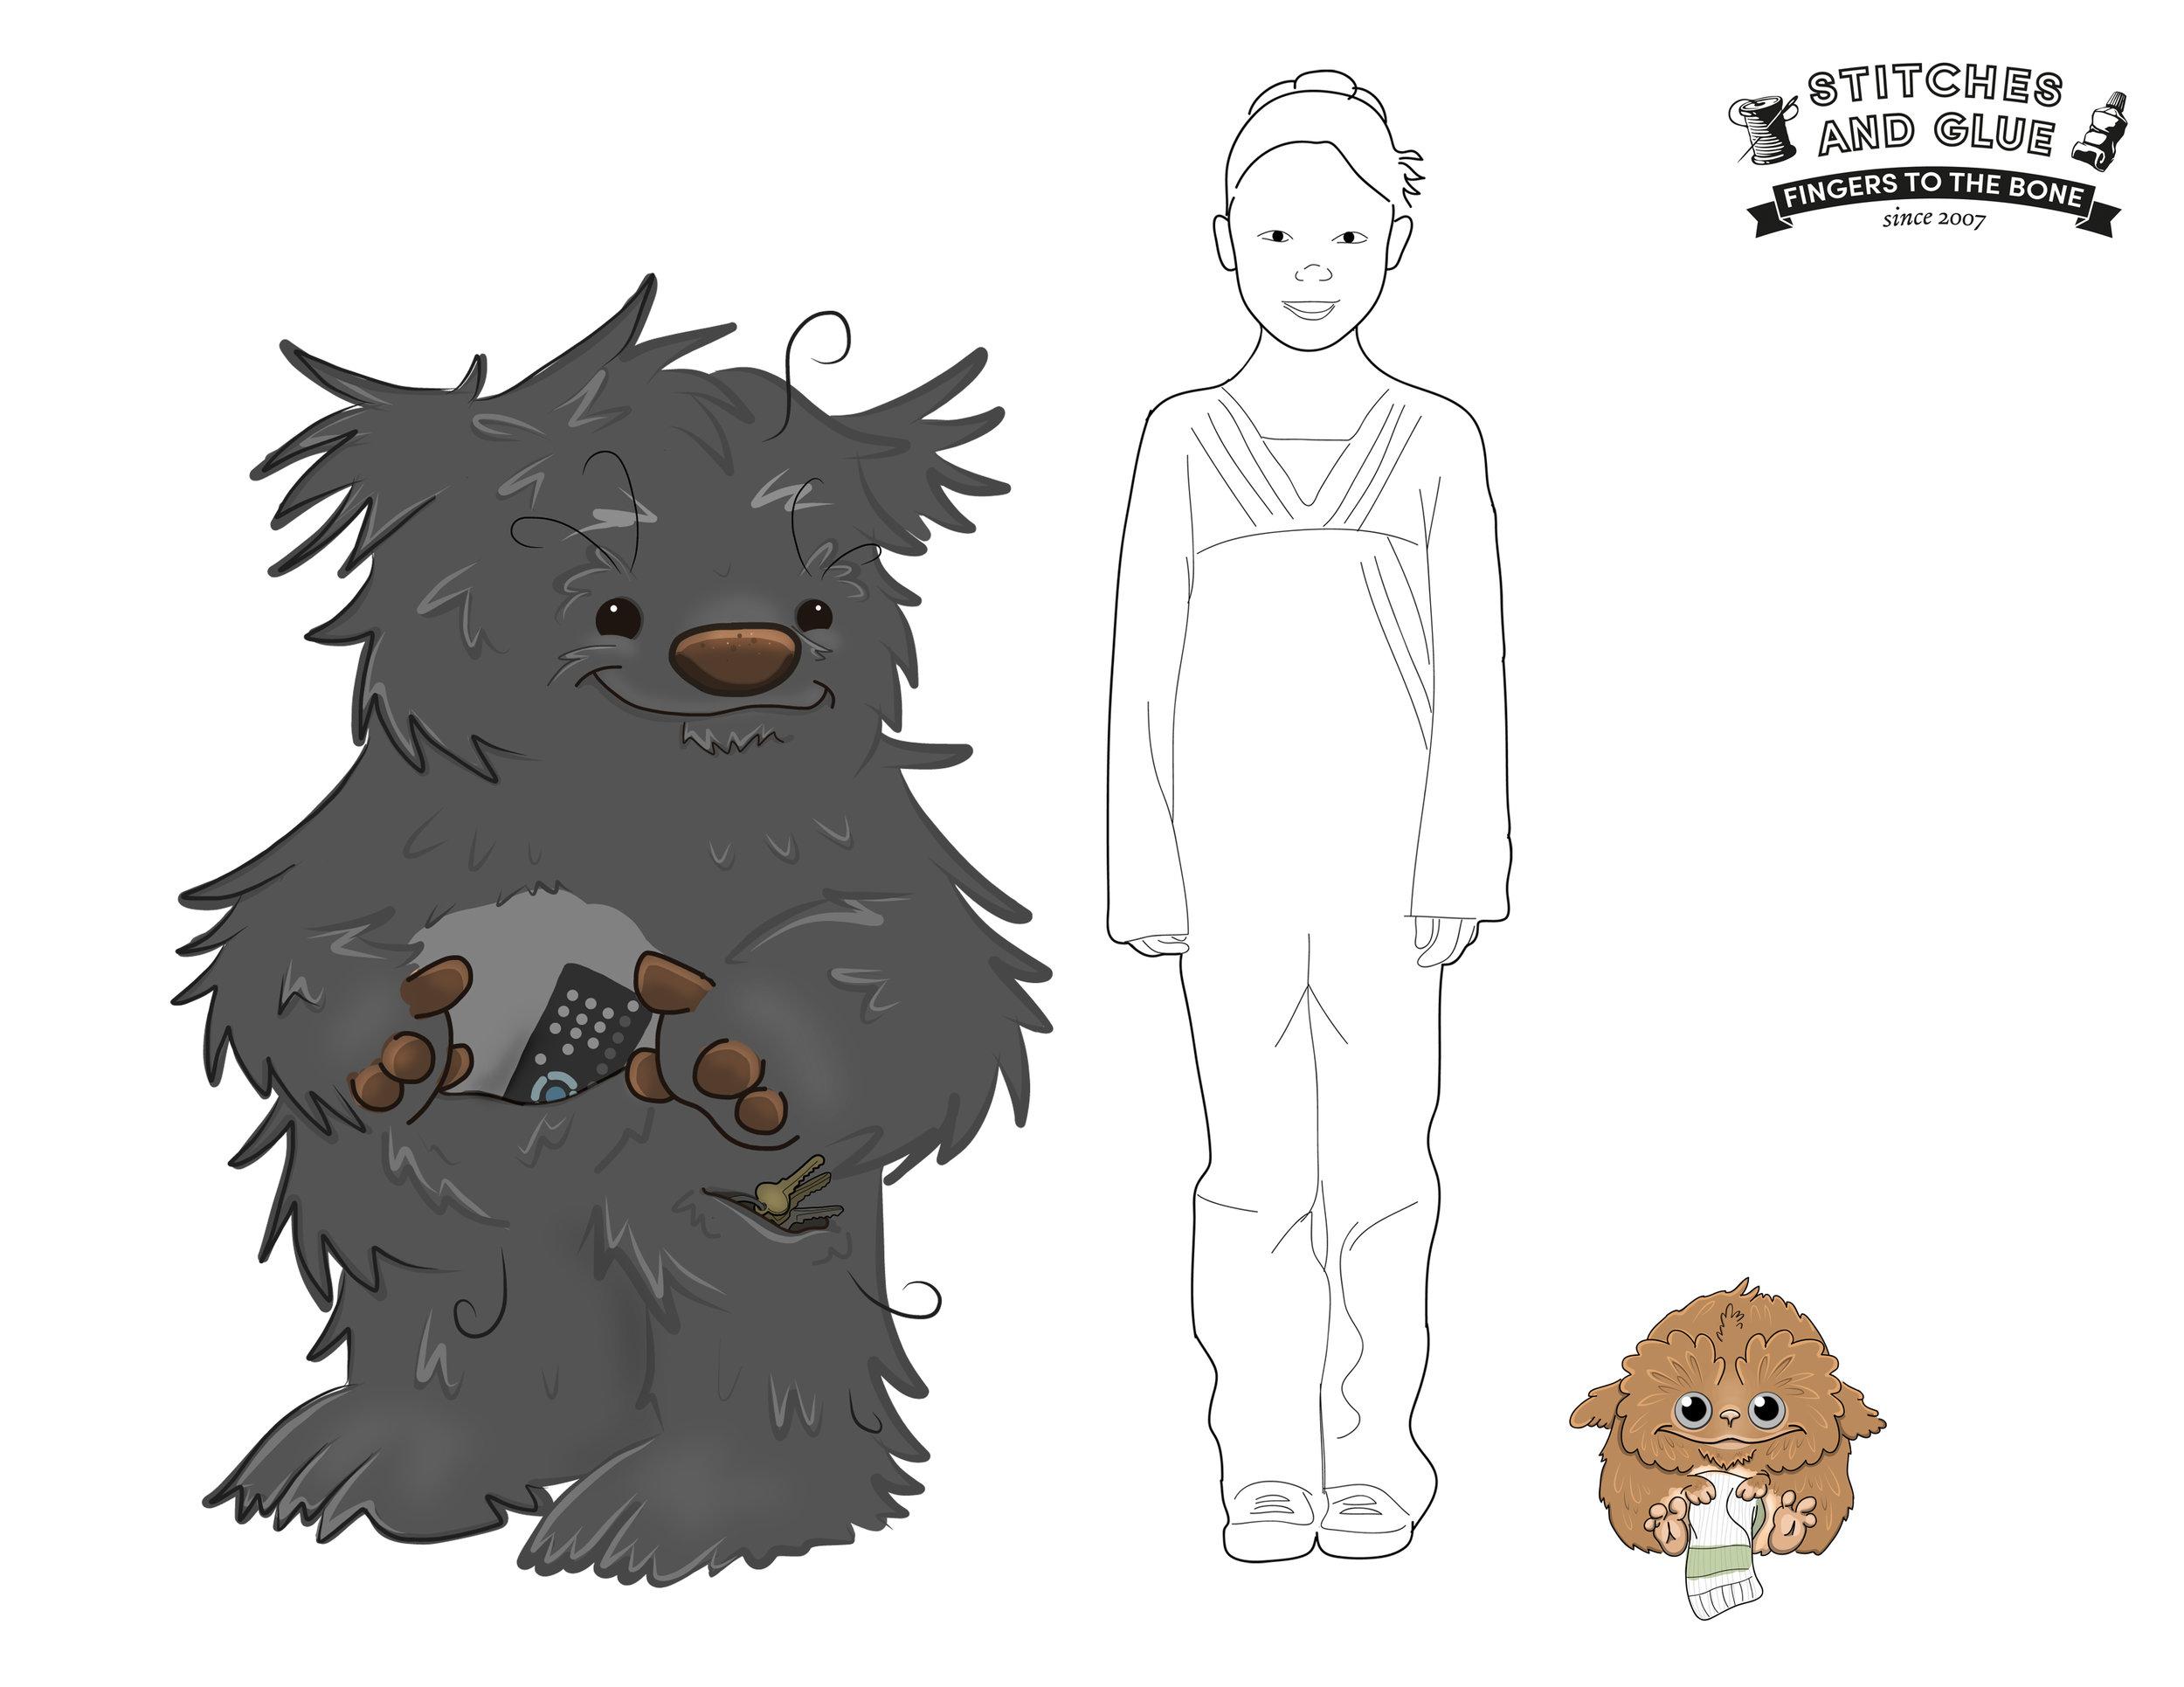 Puppet designers